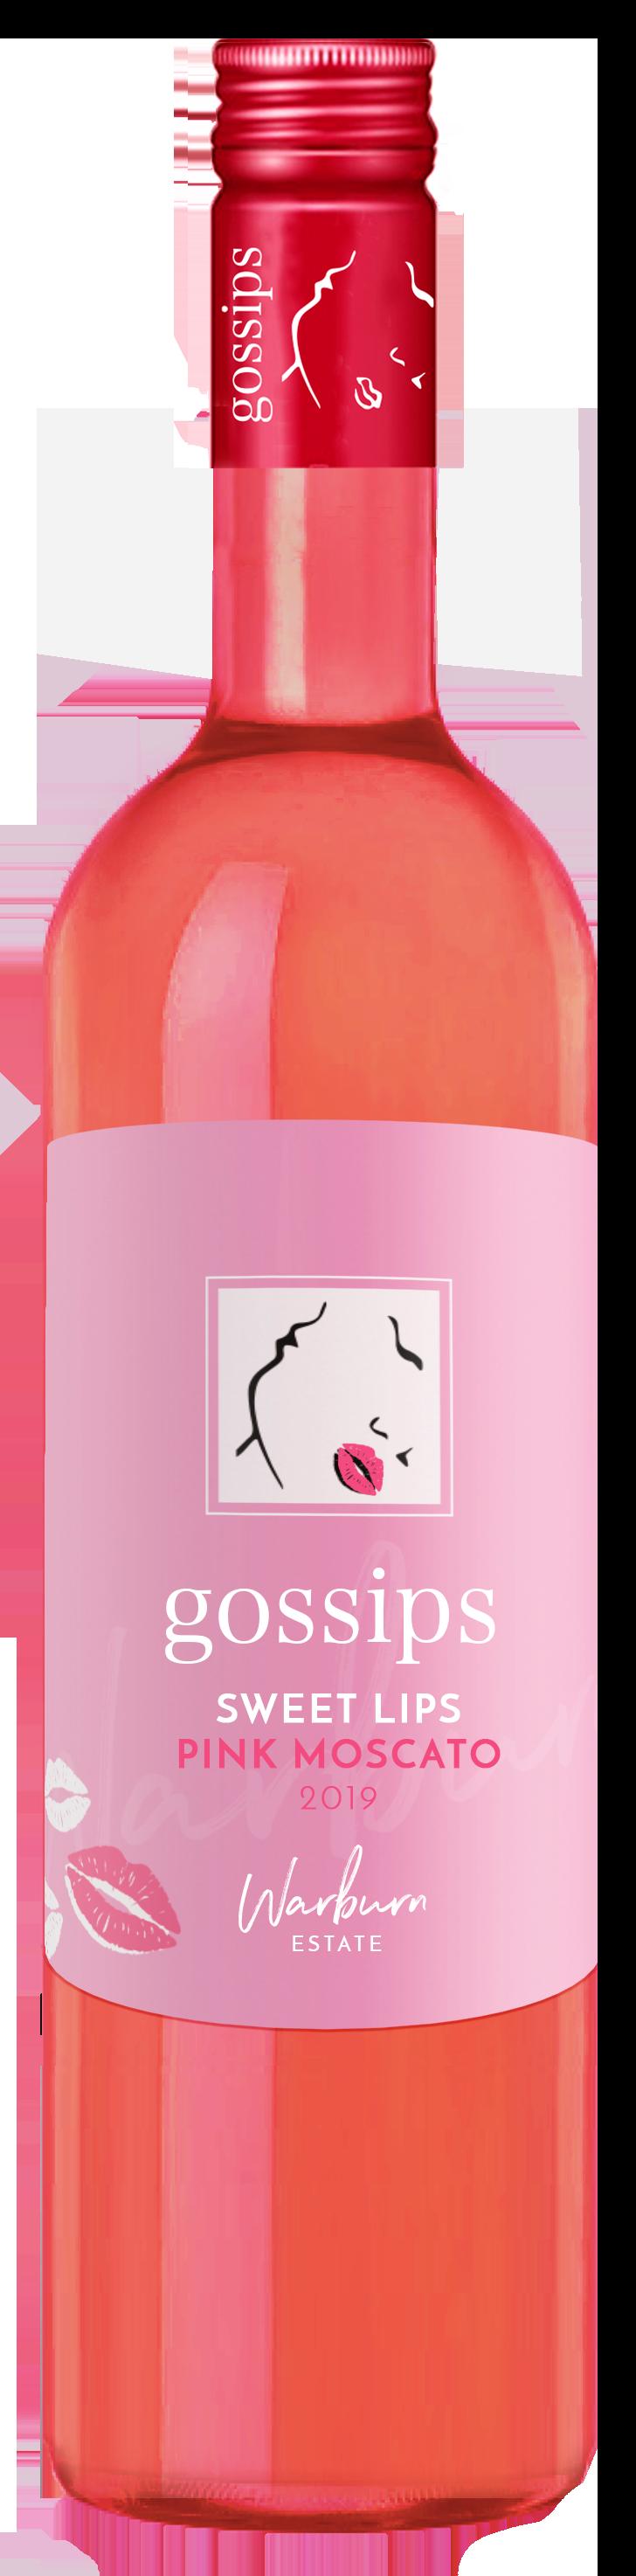 Gossips Pink Sweet Lips Moscato